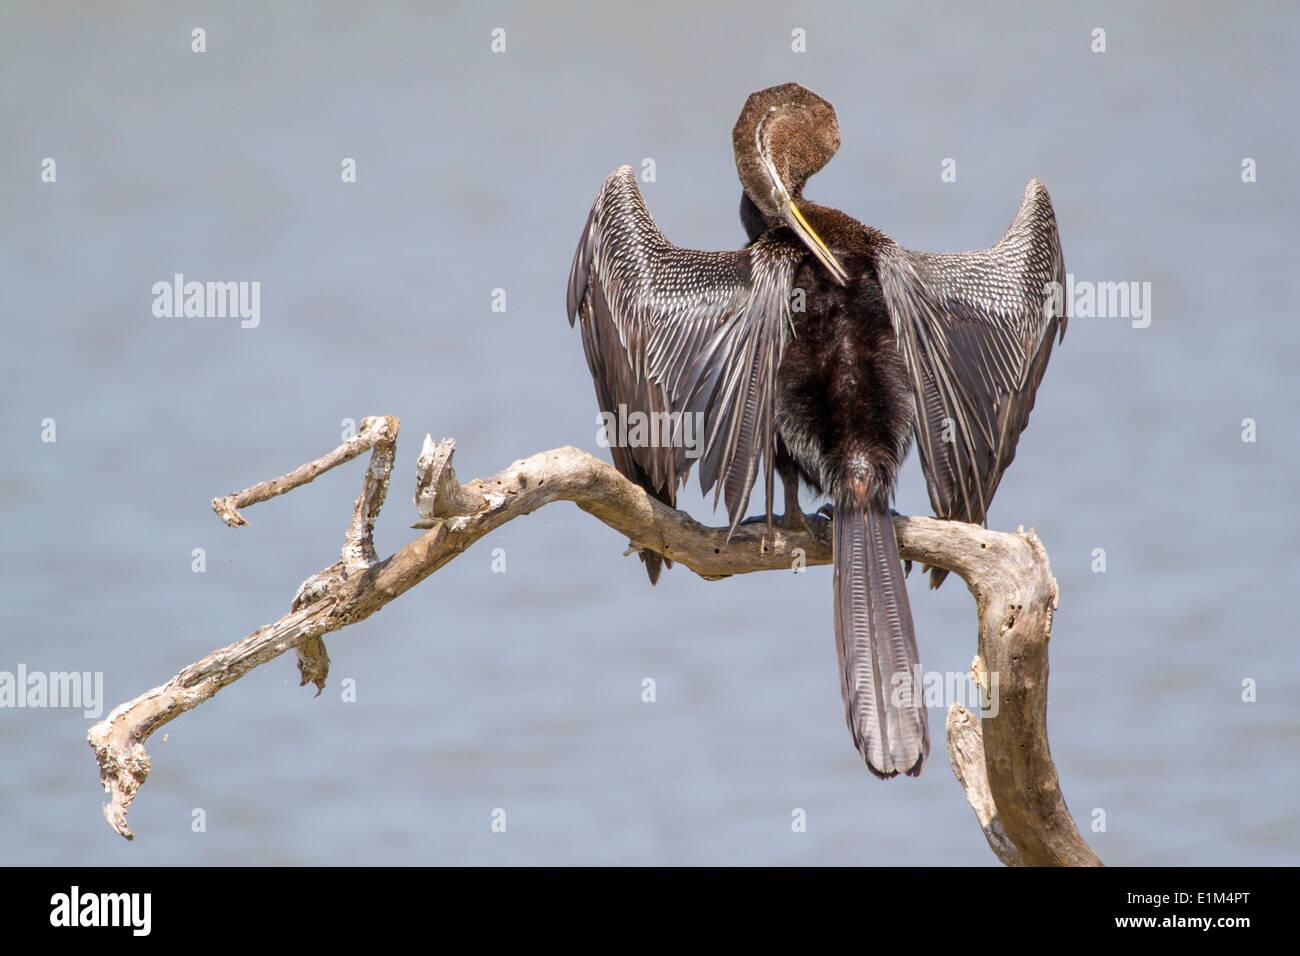 Oriental Darter or Indian Snakebird wings outspread, in Yala National Park, Sri Lanka Asia - Stock Image